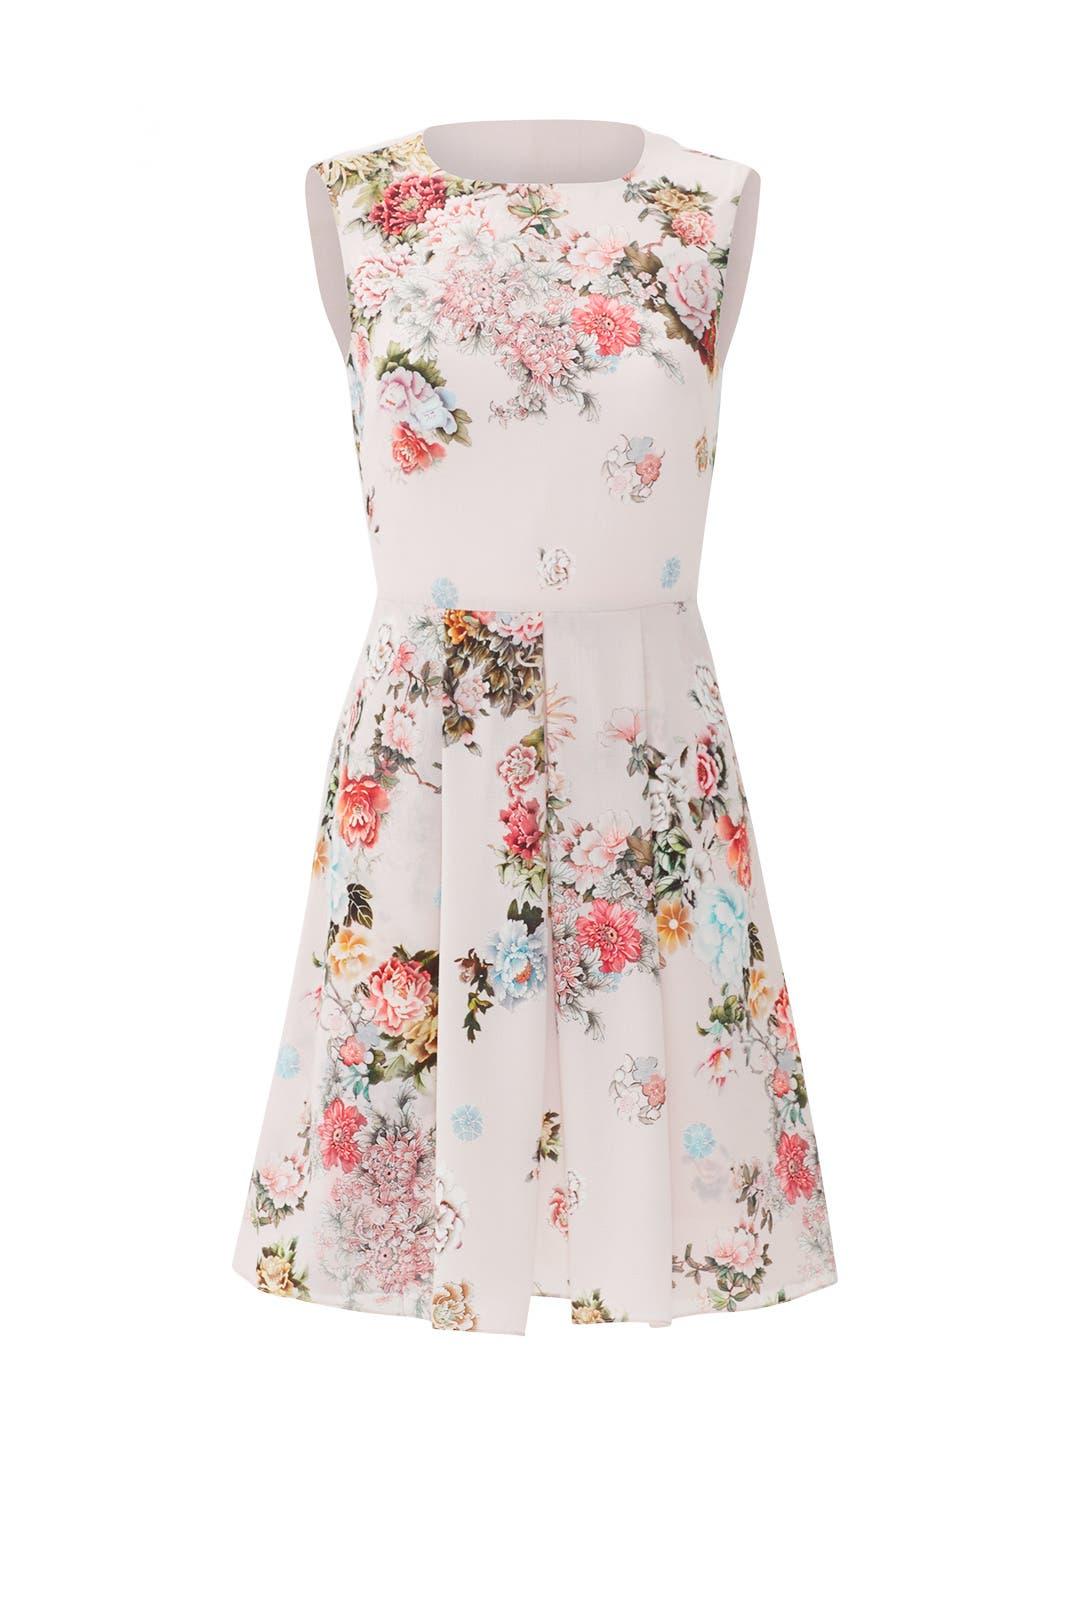 coctail dresses Garden Grove